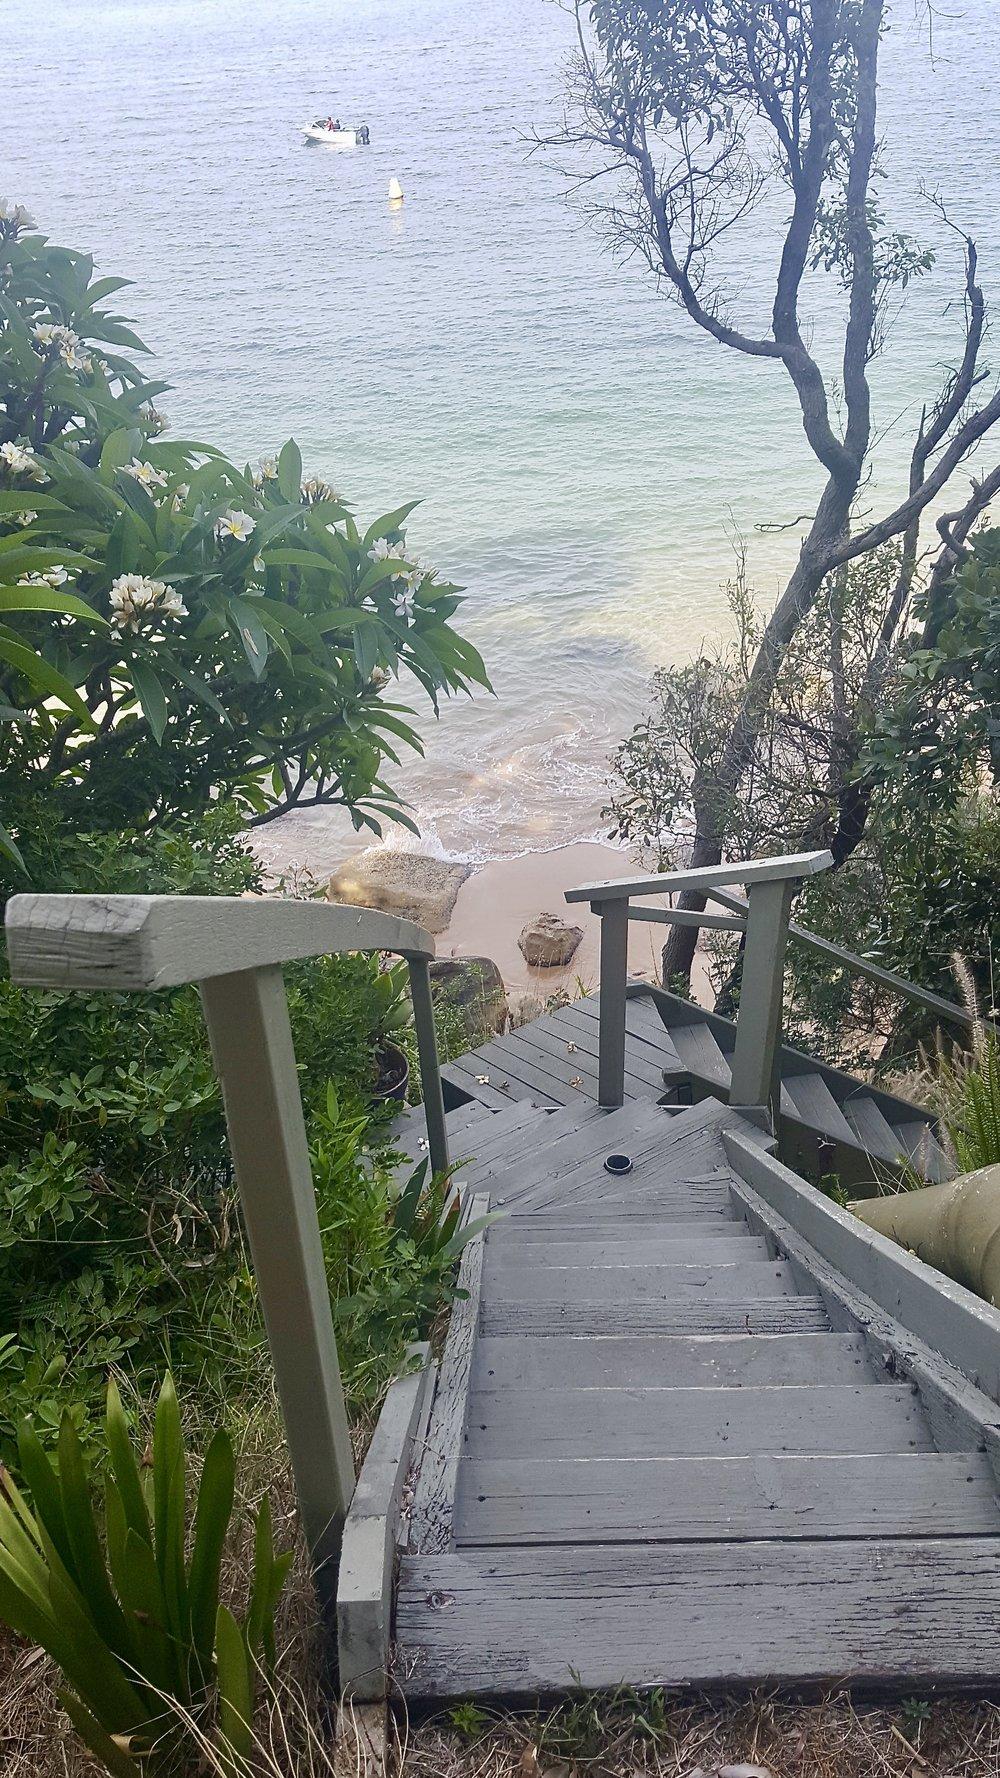 Steps at Great Mackerel Beach, Ku-ring-gai Chase National Park, Sydney, New South Wales